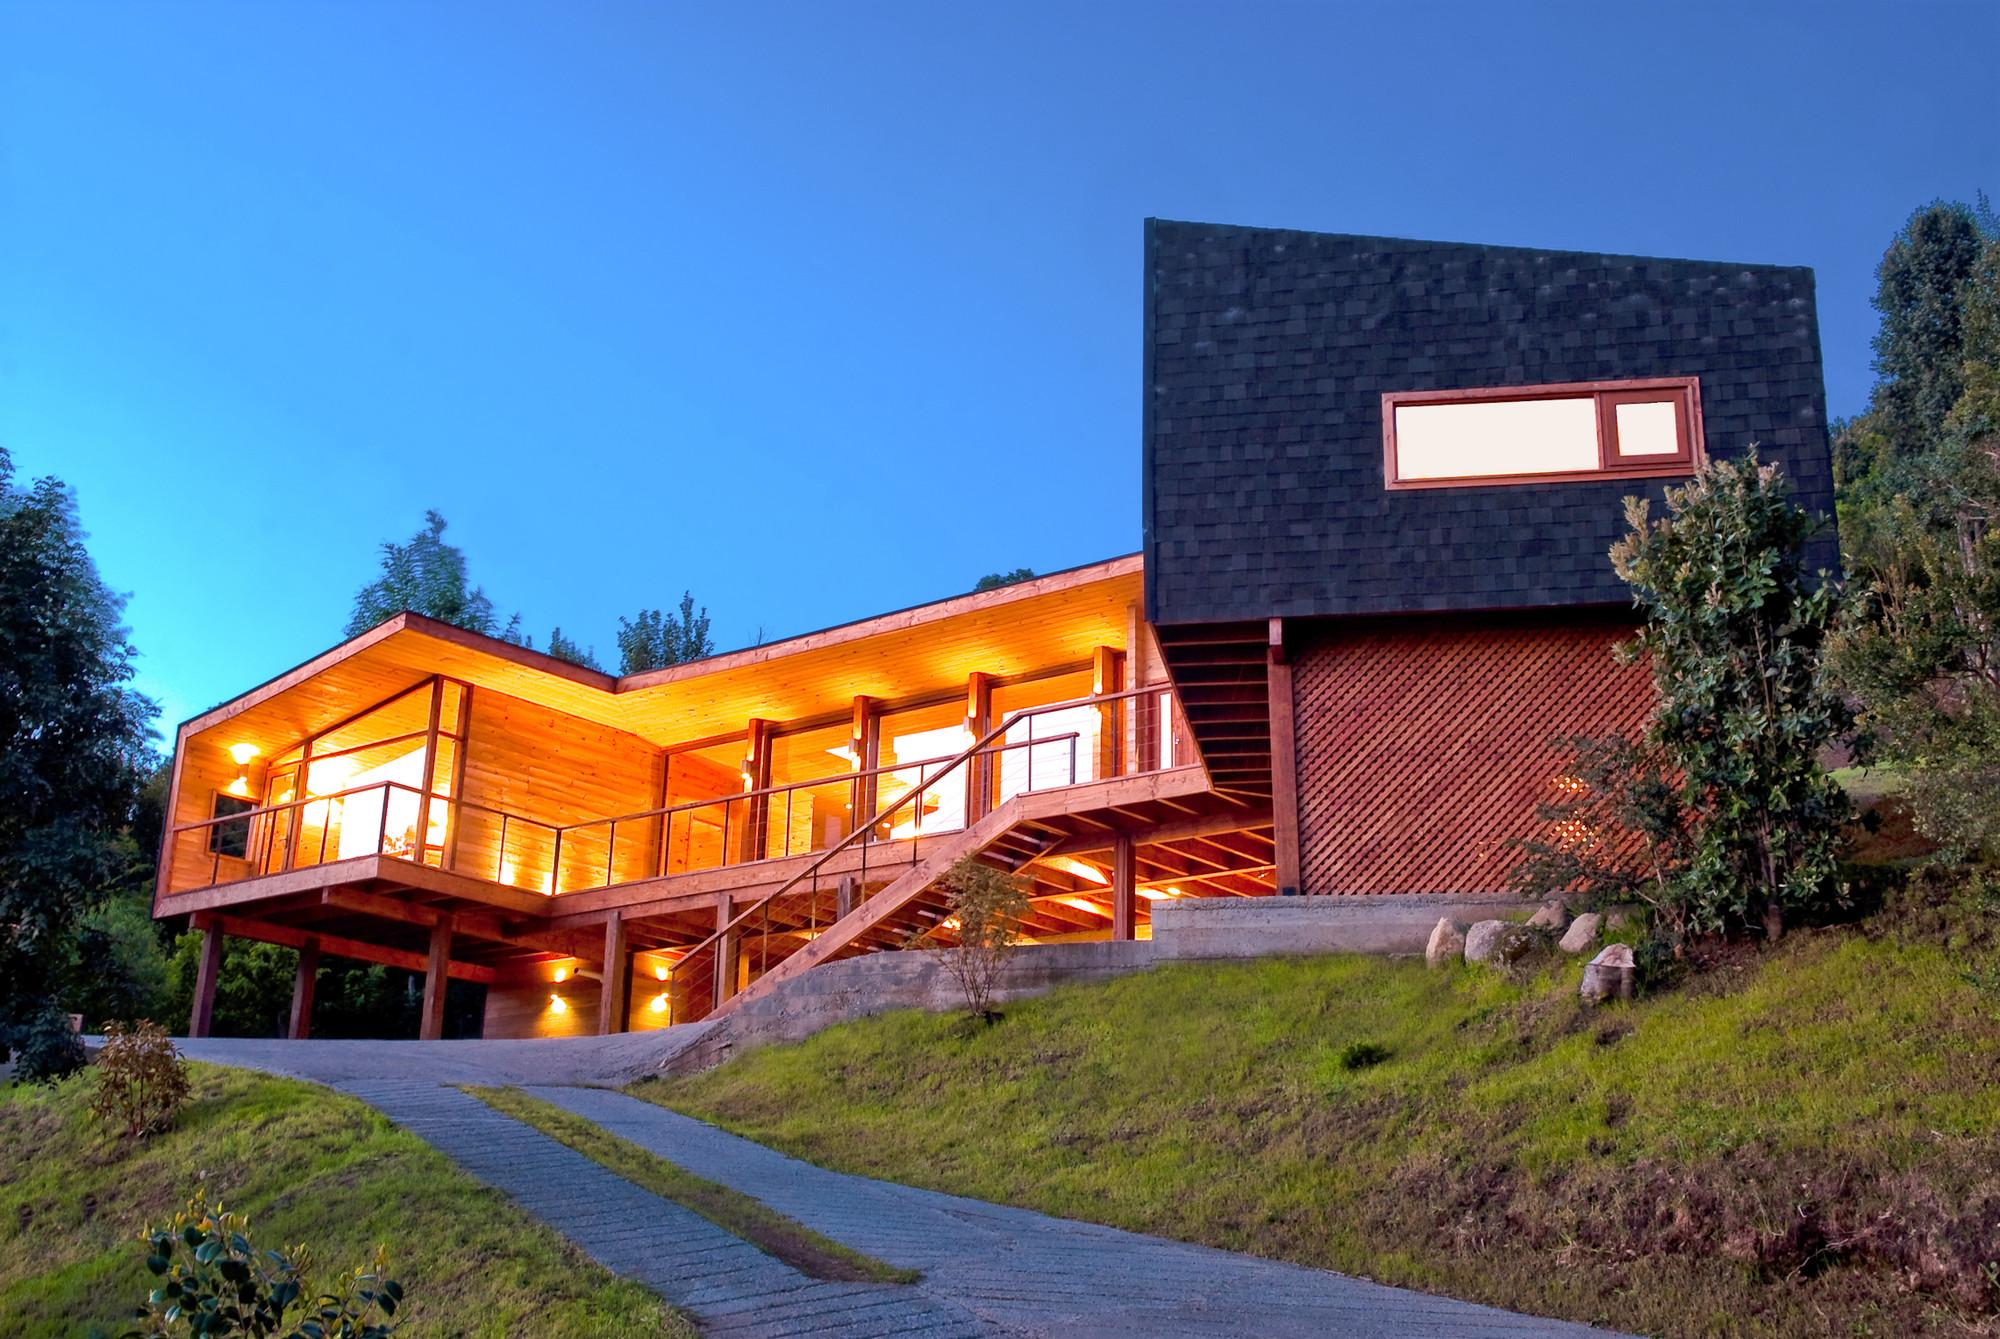 Maldonado House / Matías Silva Aldunate Architect